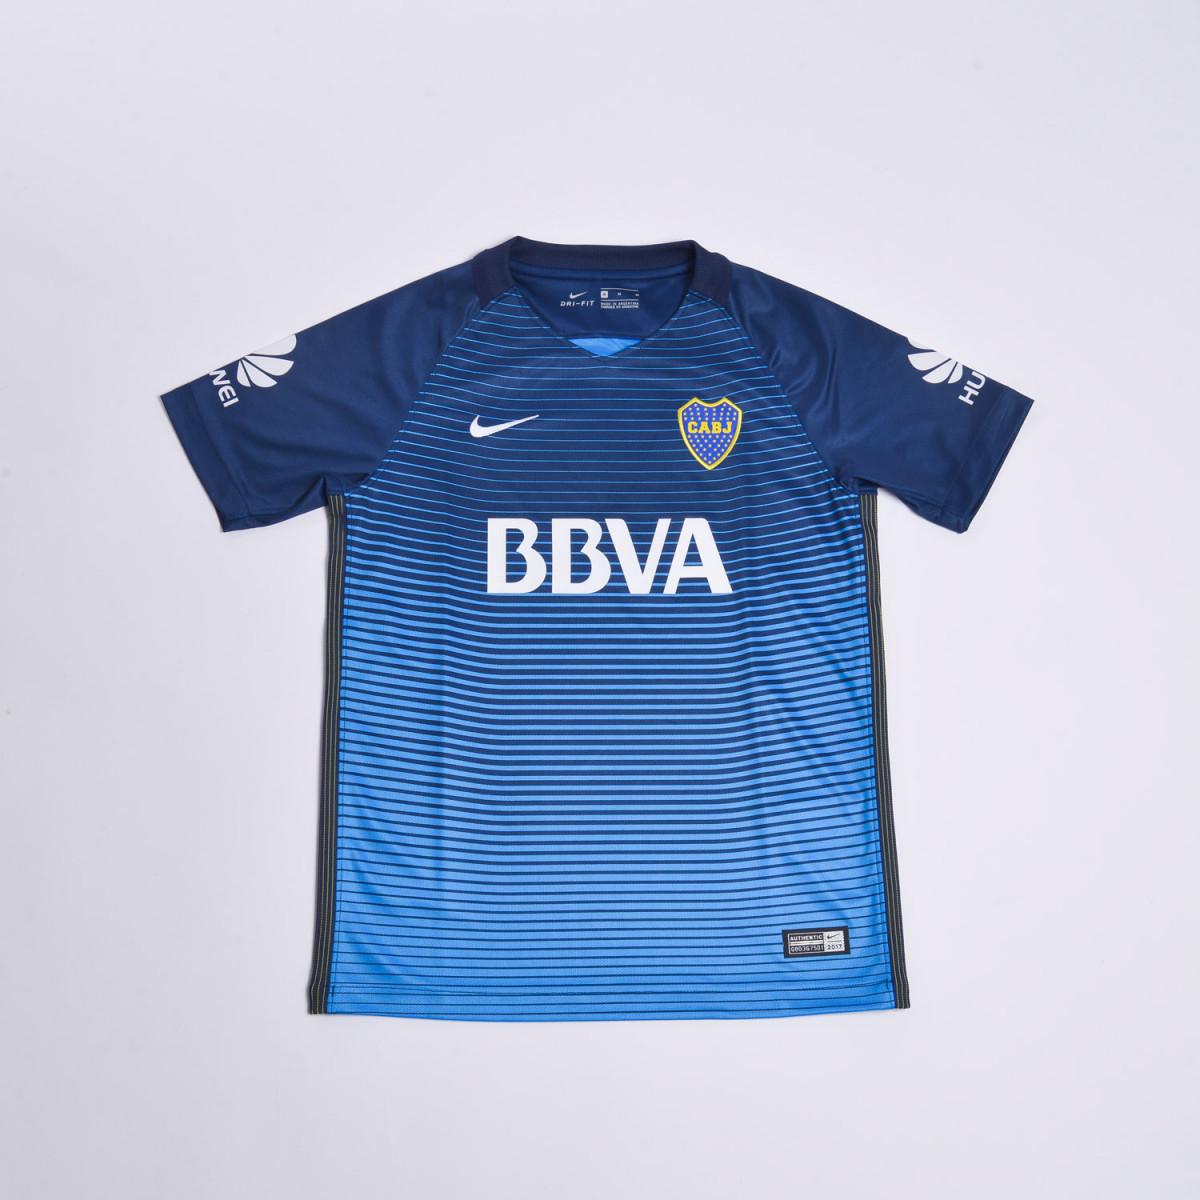 Camiseta De Futbol Nike Boca Juniors Boys